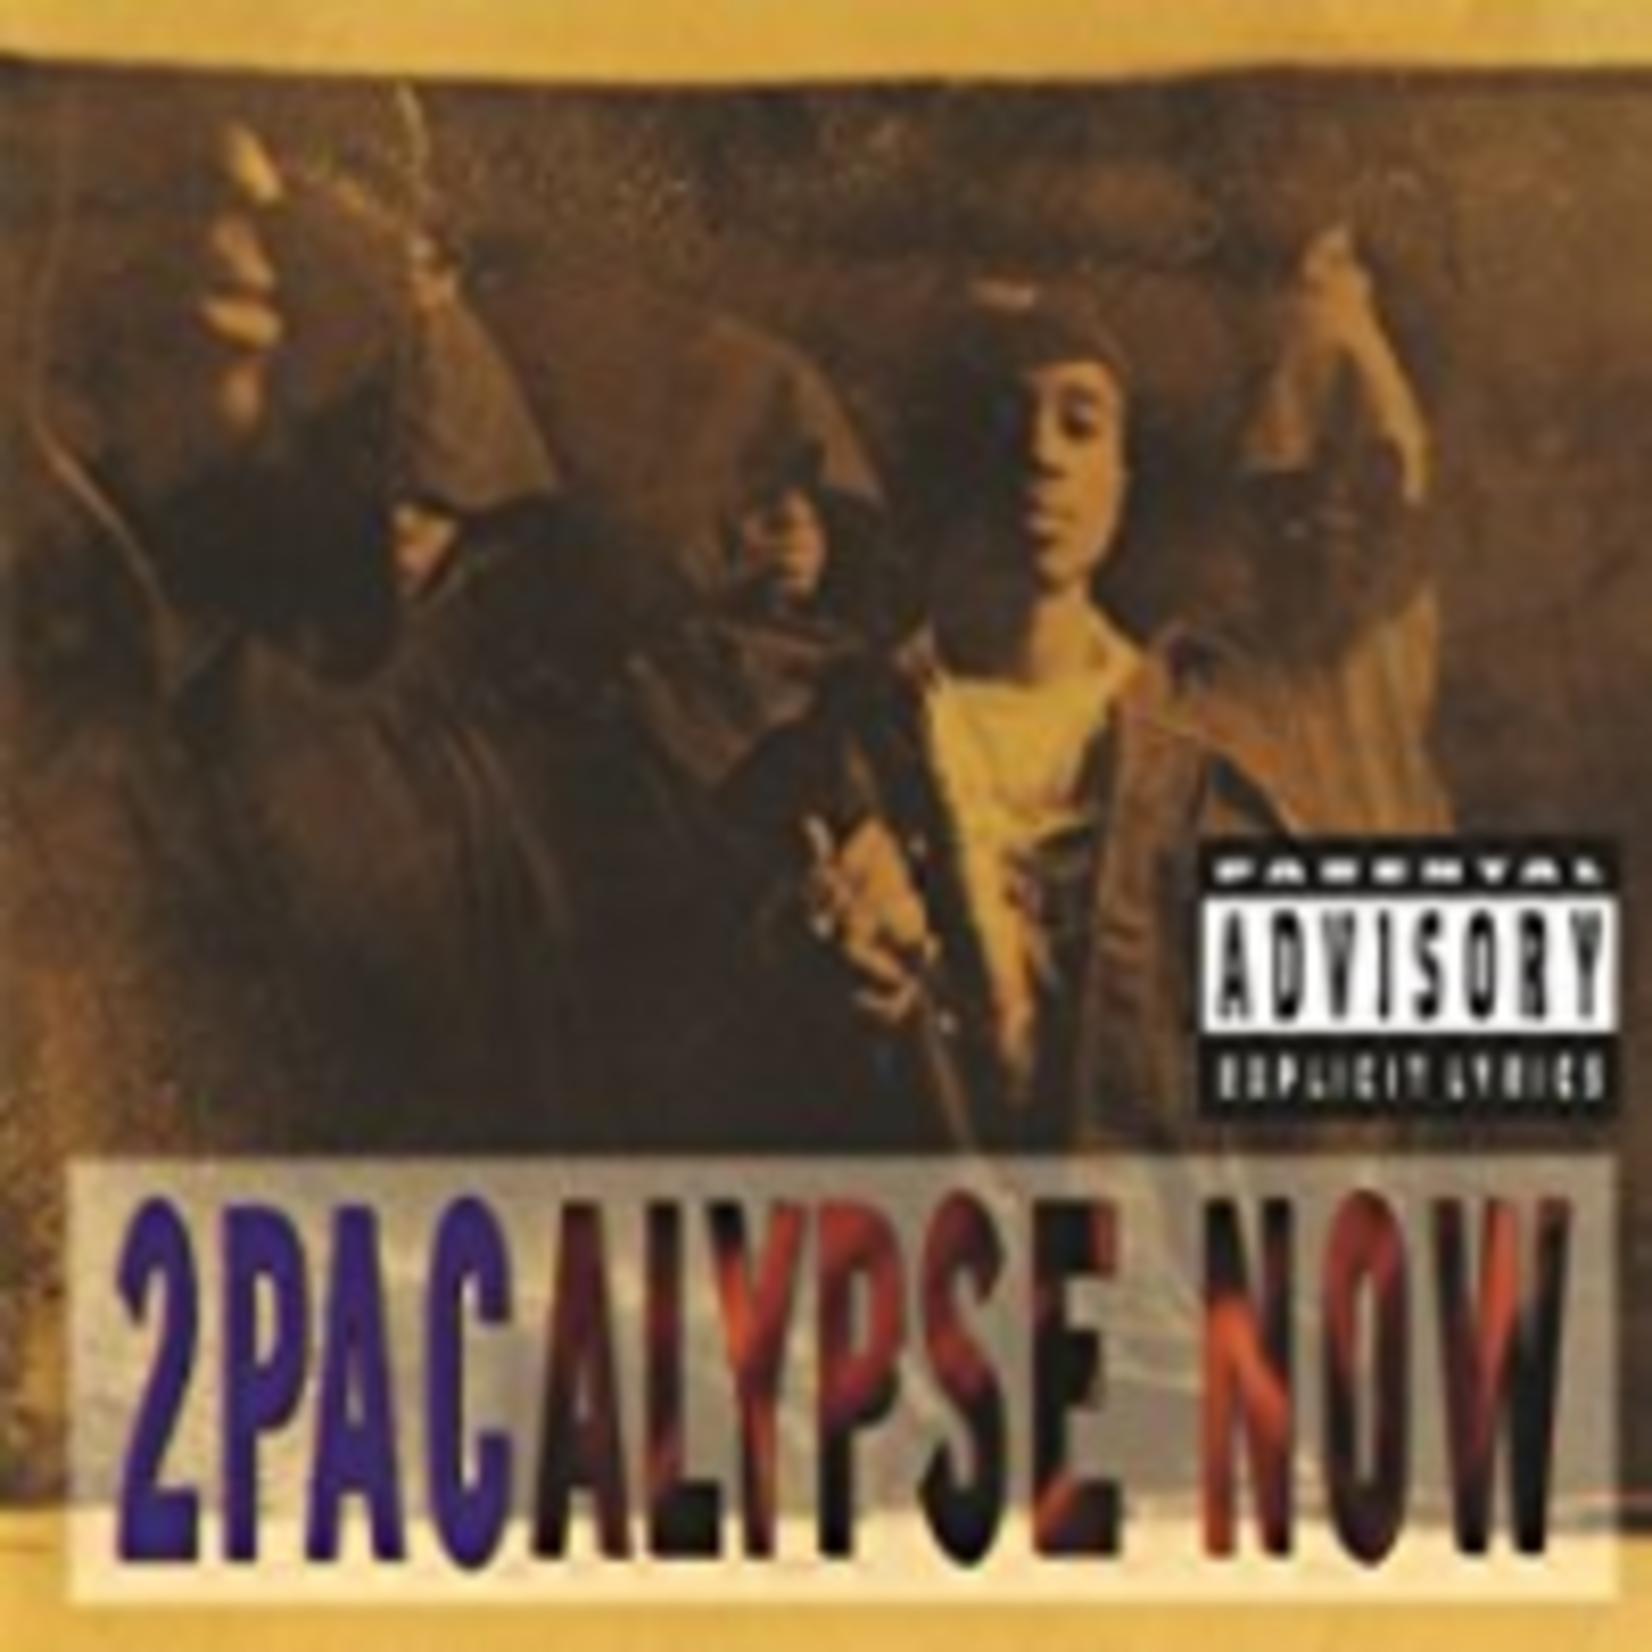 2PAC 2PACALYPSE NOW